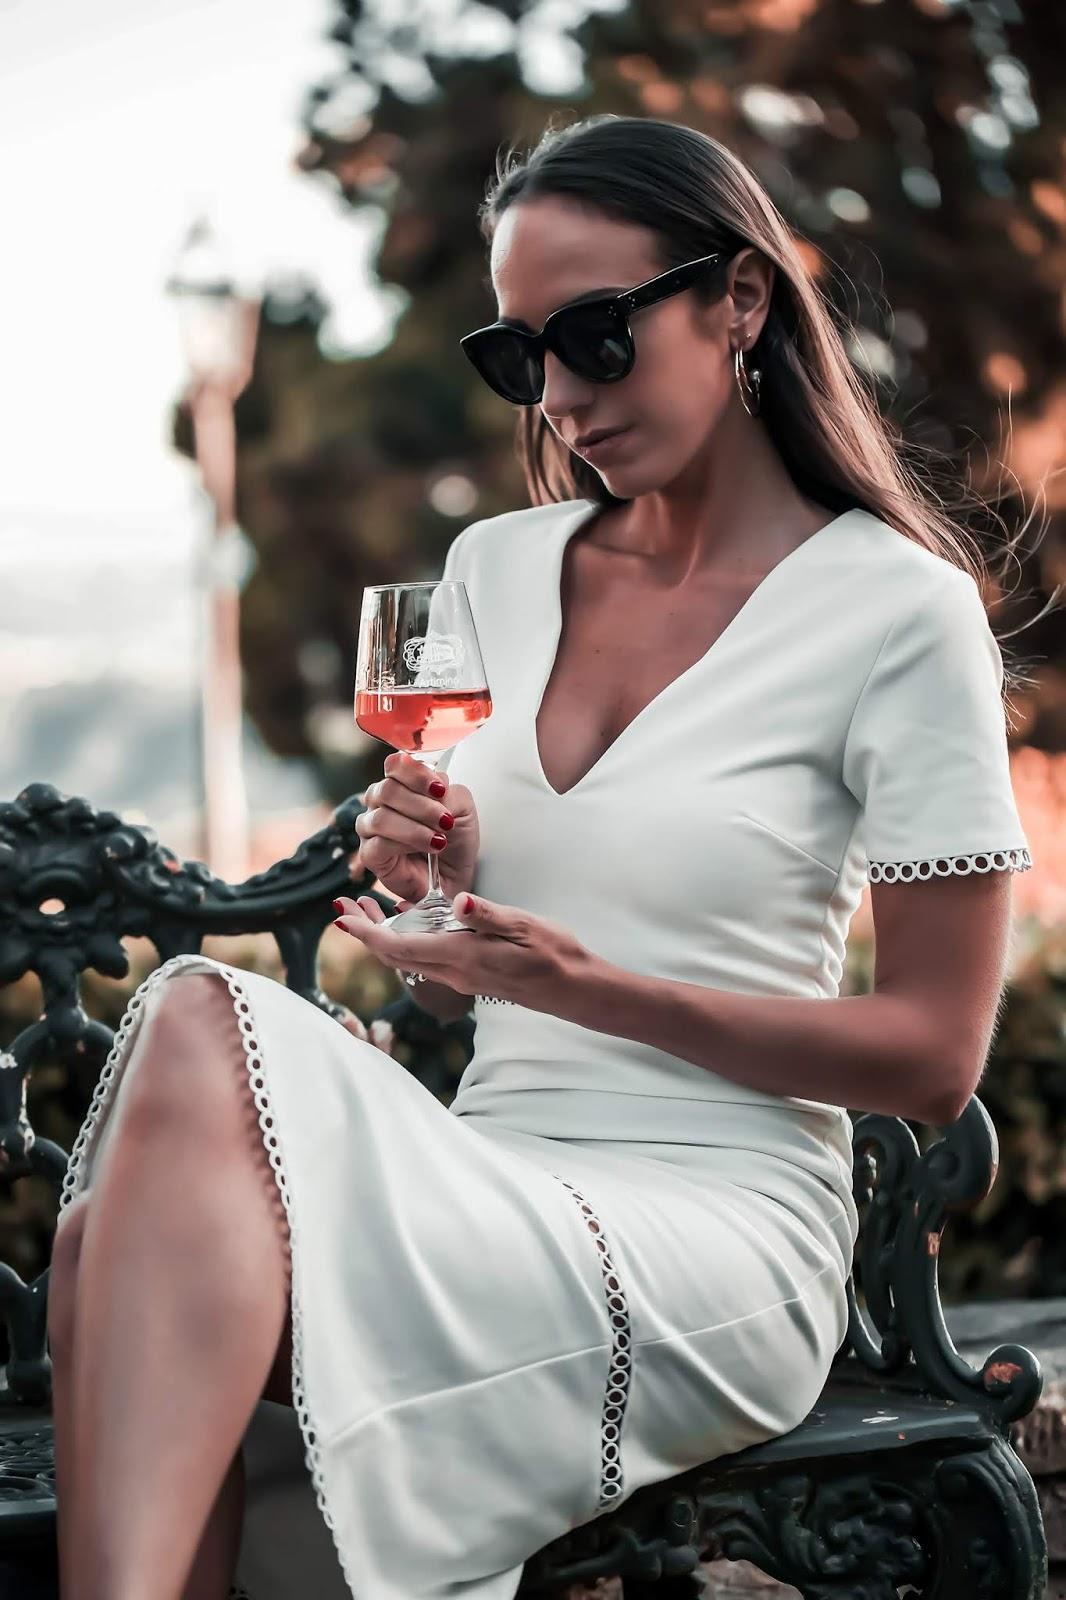 bere vino fa bene